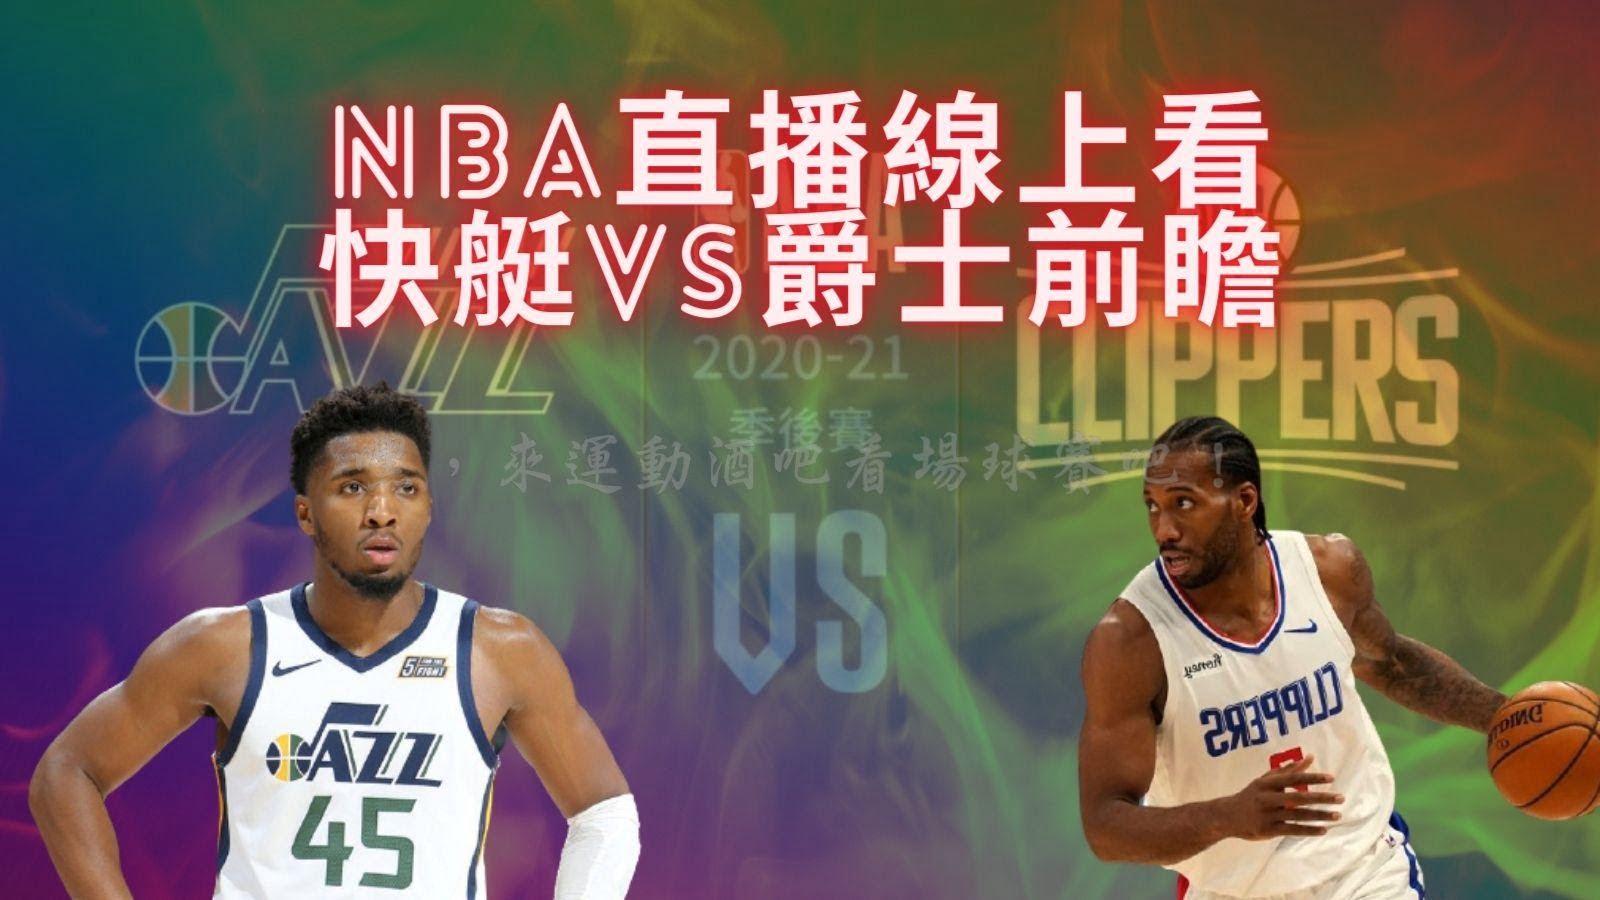 NBA直播線上看:快艇VS爵士前瞻